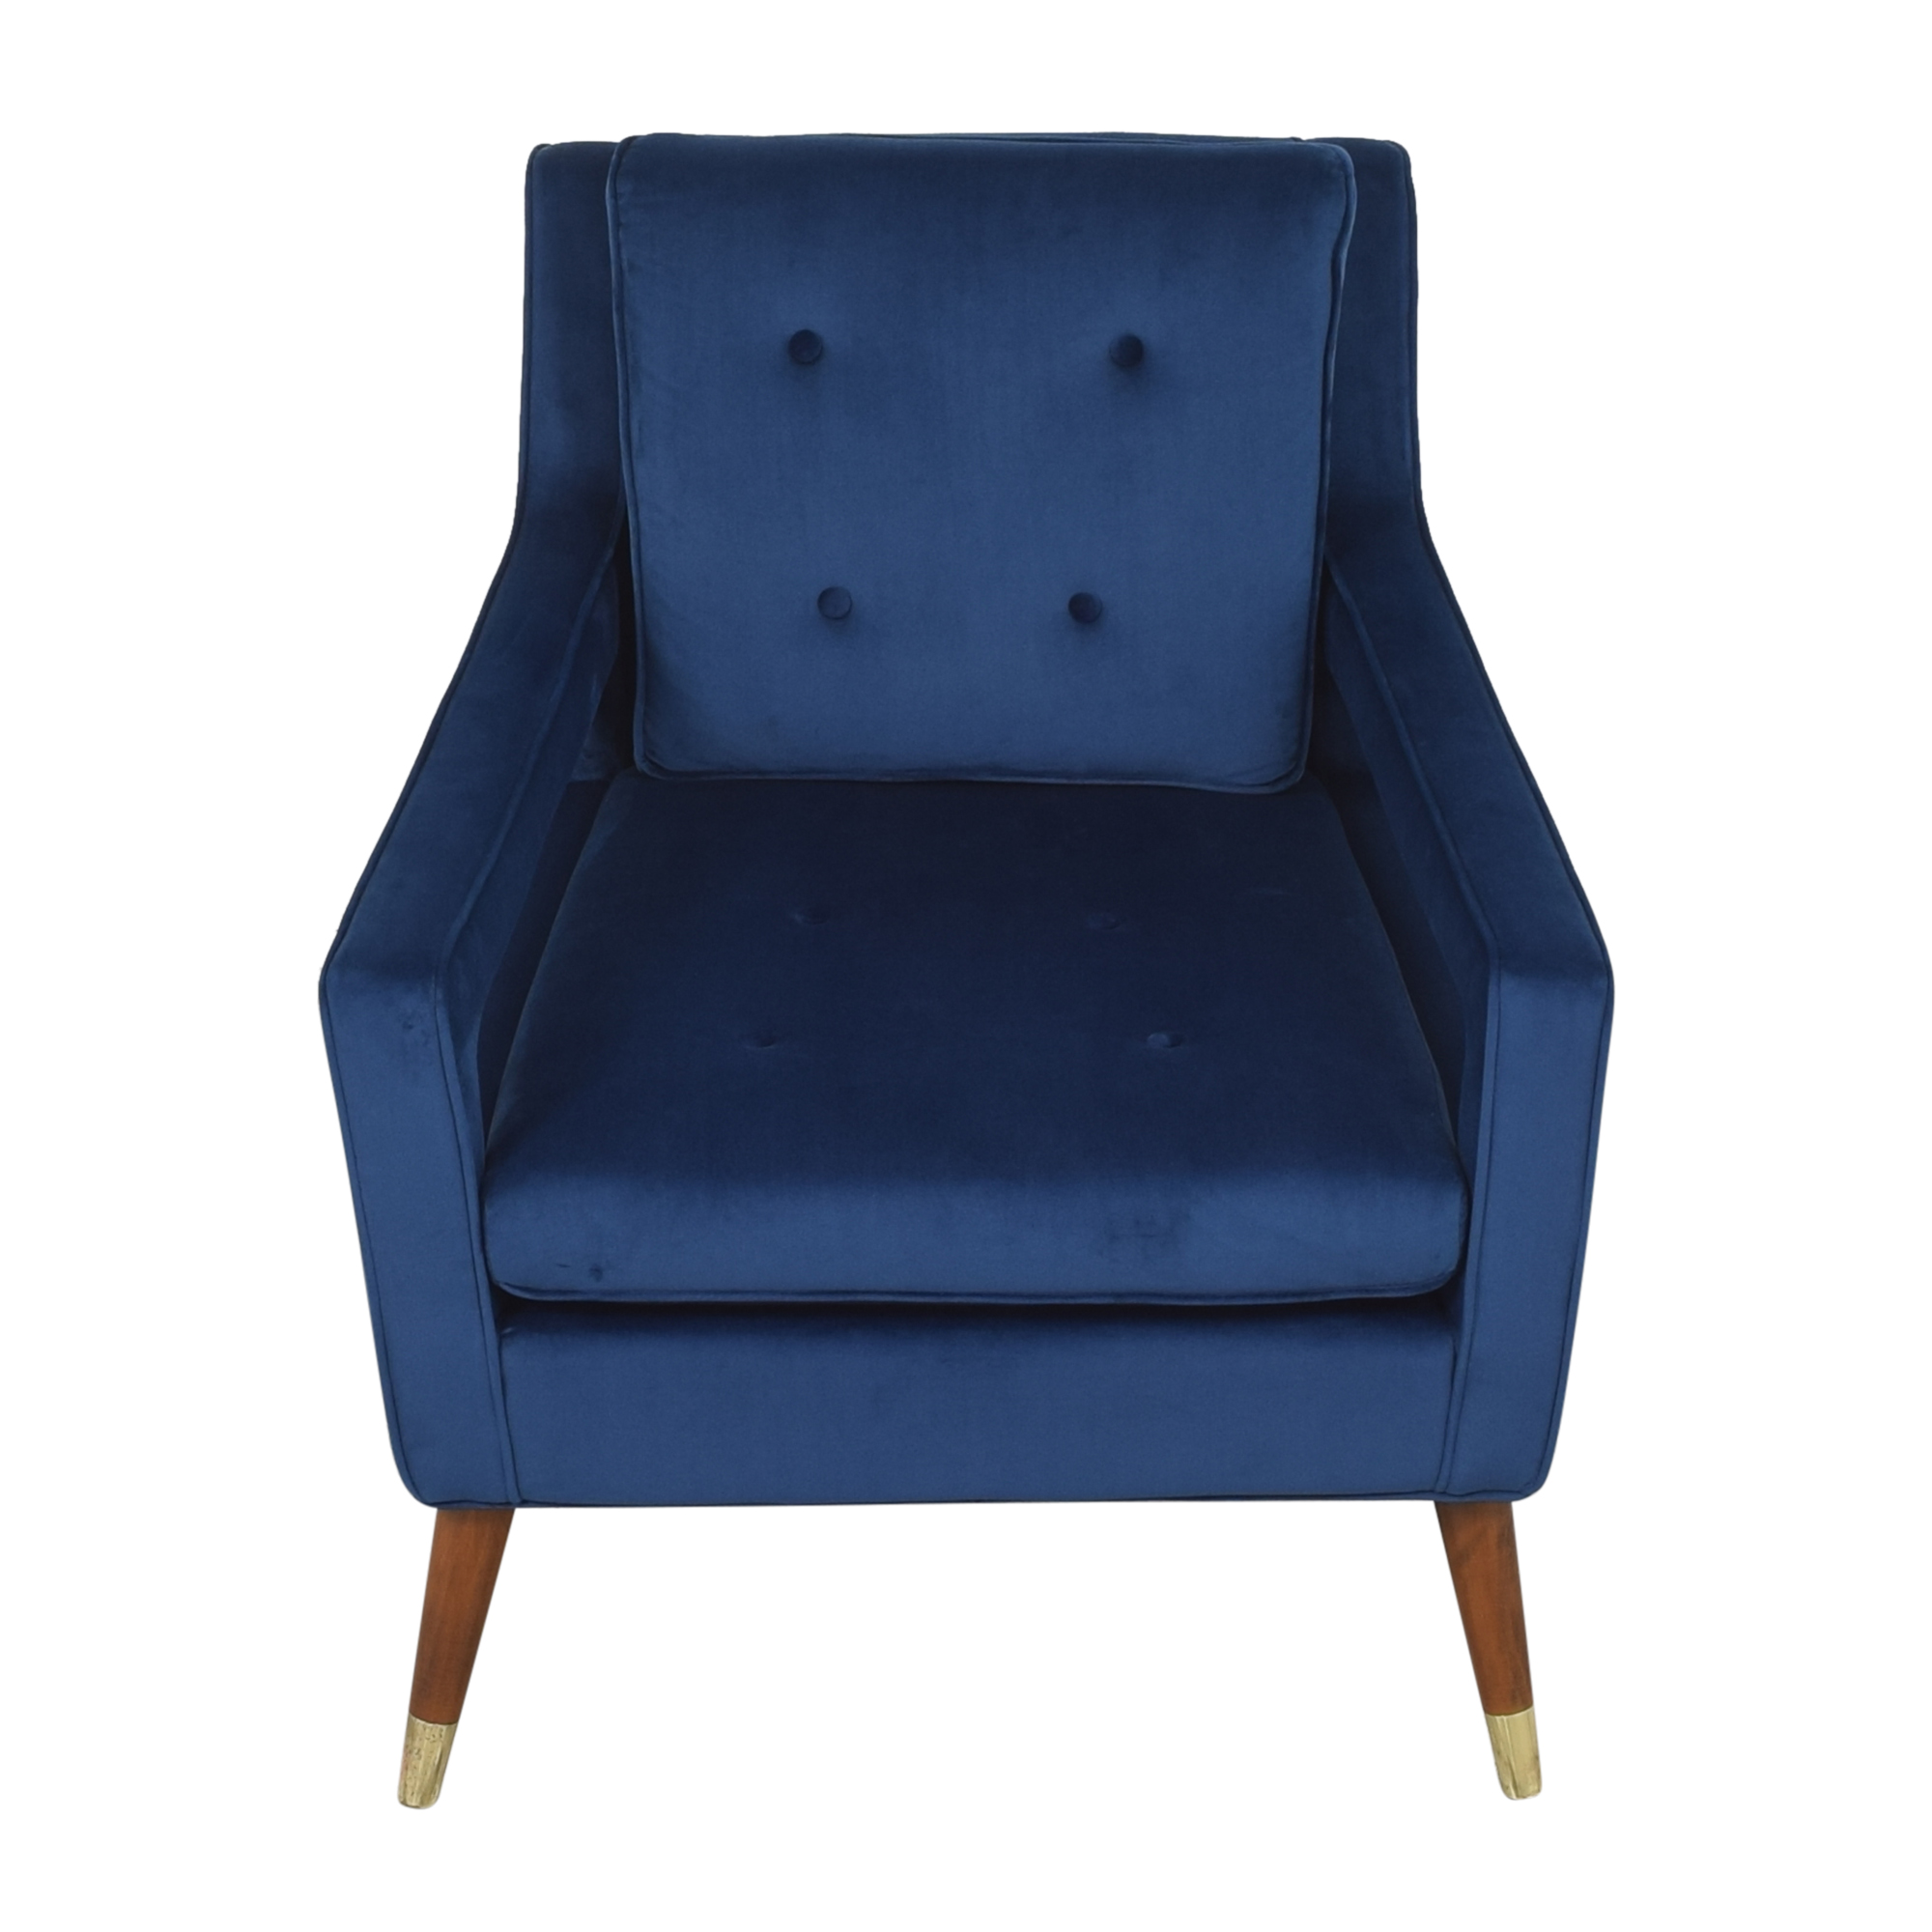 Tov Draper Chair sale